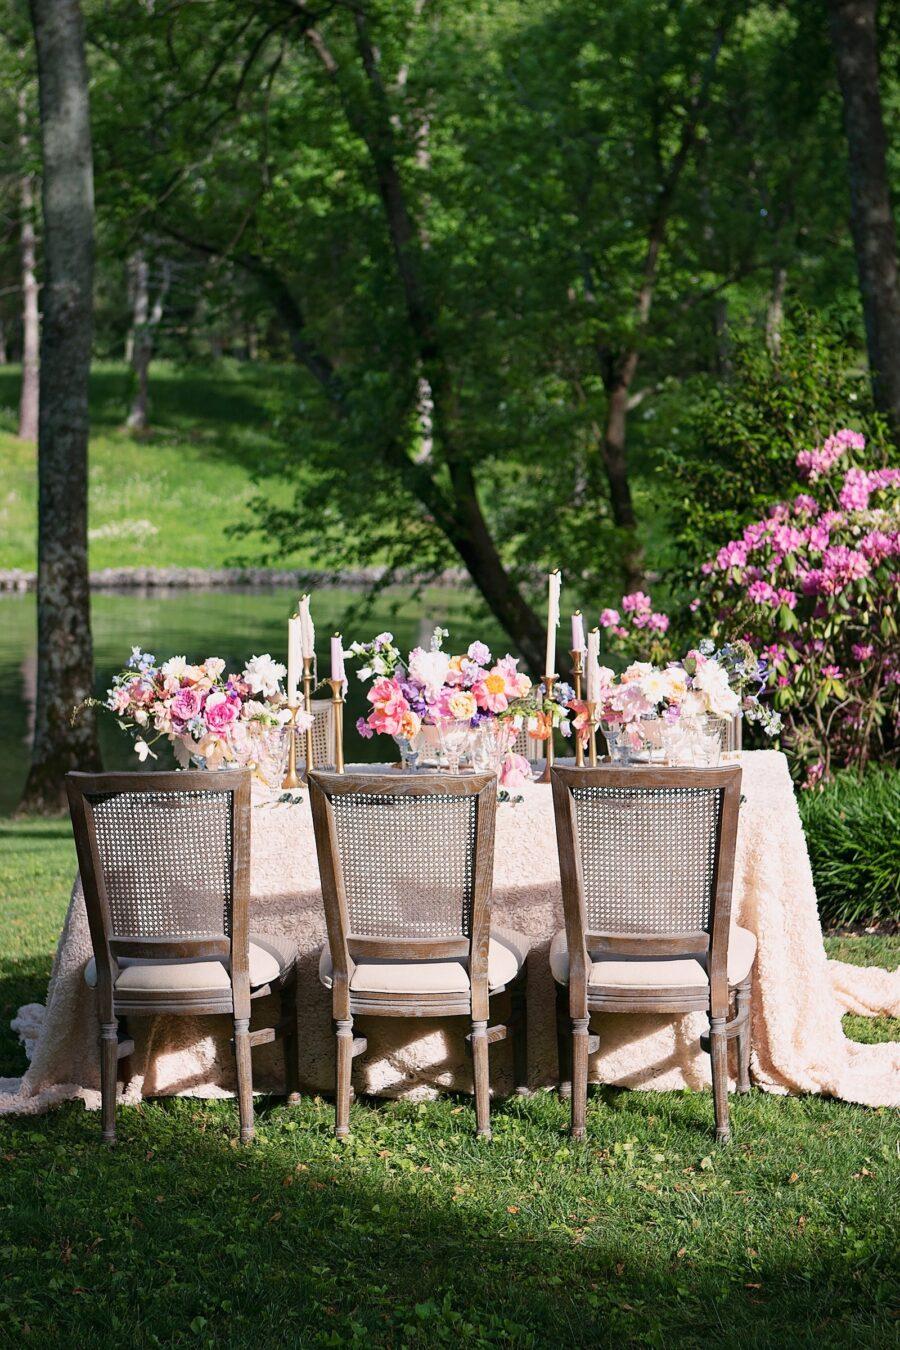 Outdoor spring wedding inspiration